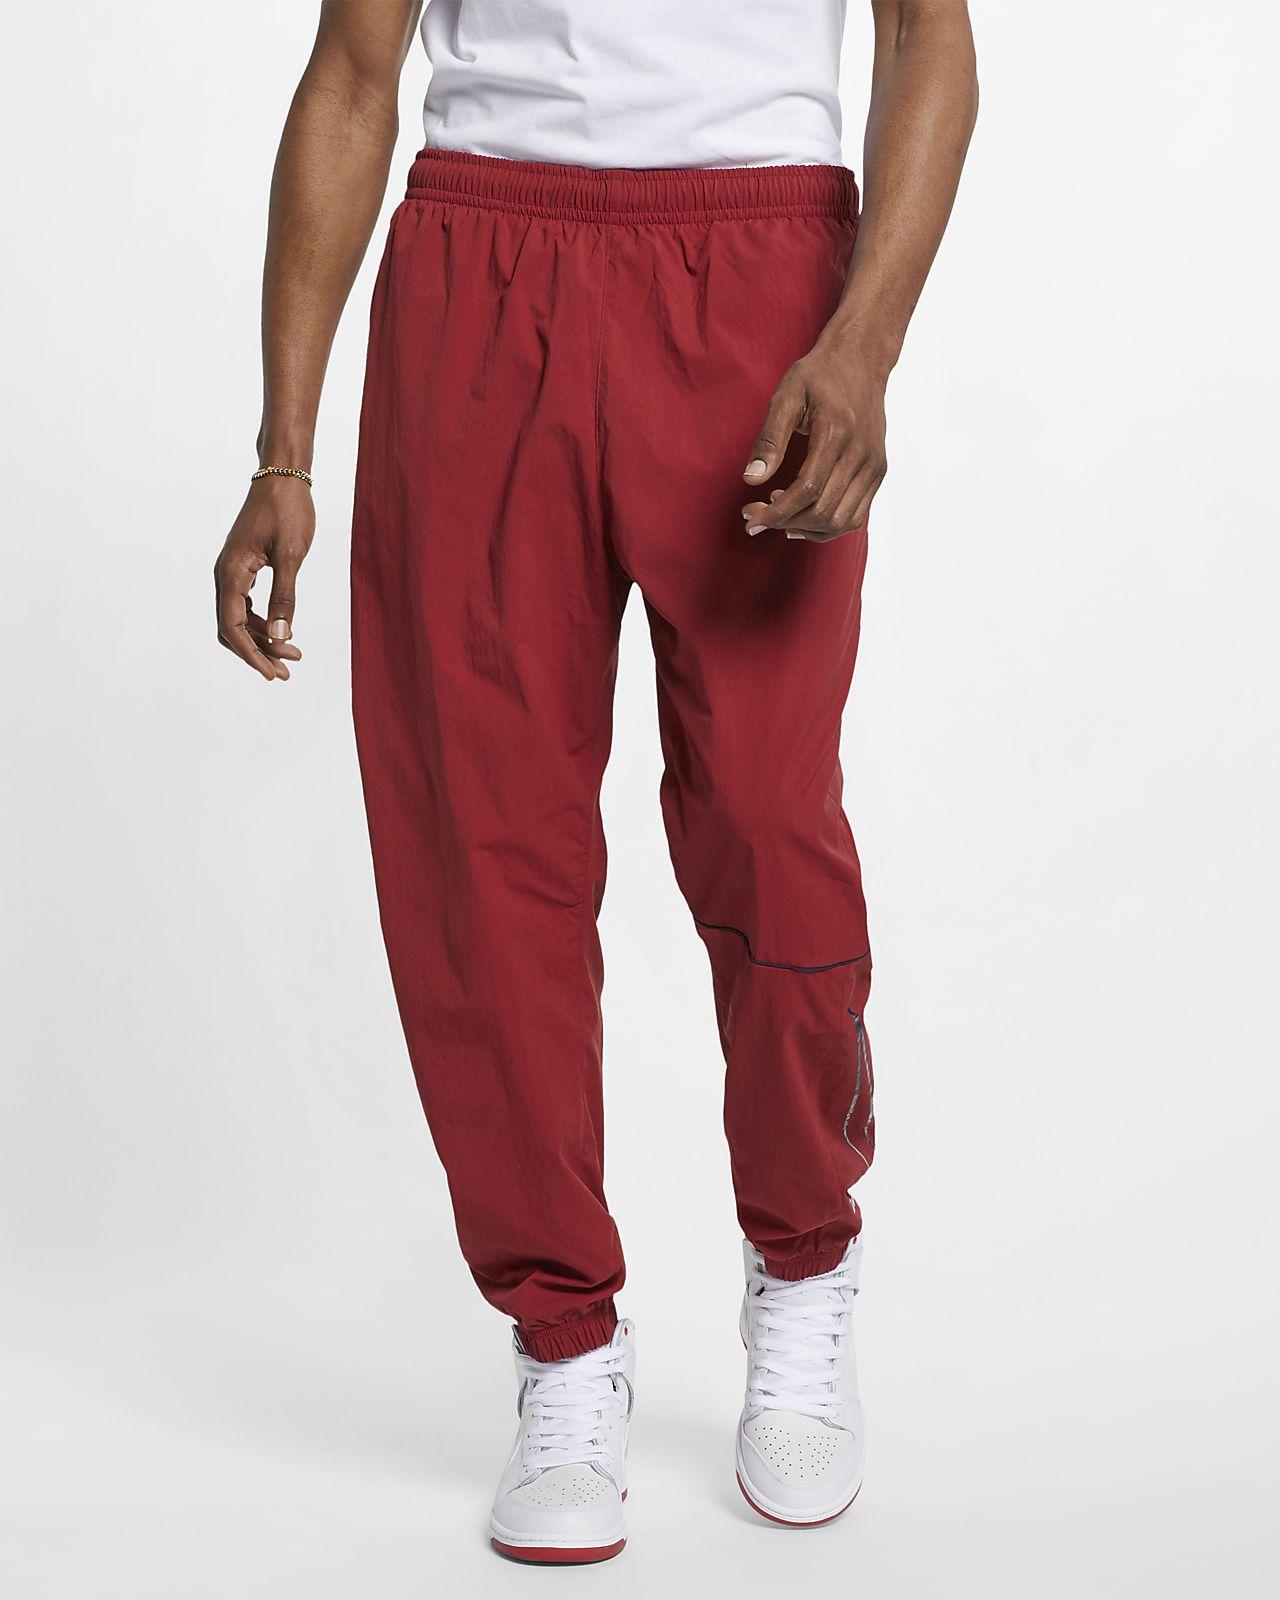 Pantalon de survêtement pour le skateboard avec Swoosh Nike SB. Nike ... e68ca6af5c9